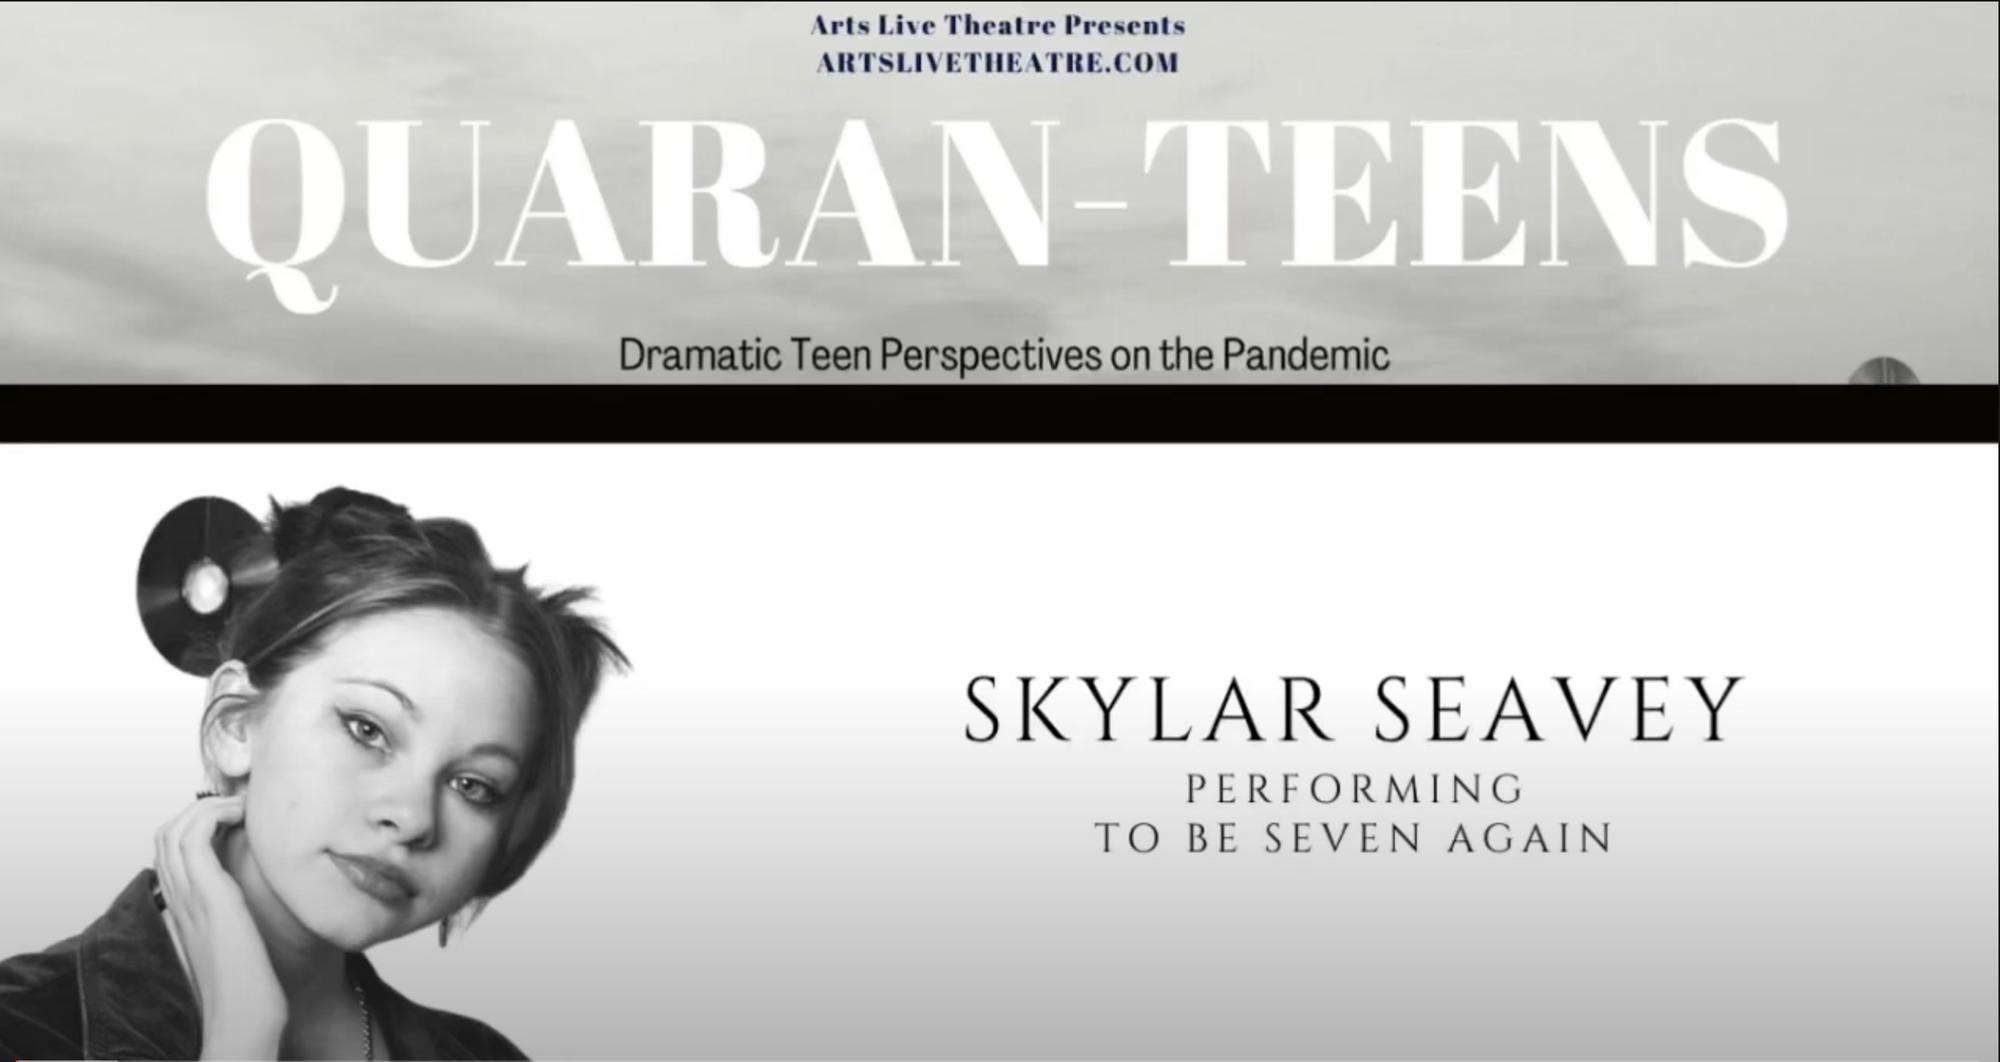 Quaran-Teens: Skylar Seavey performing To Be Seven Again